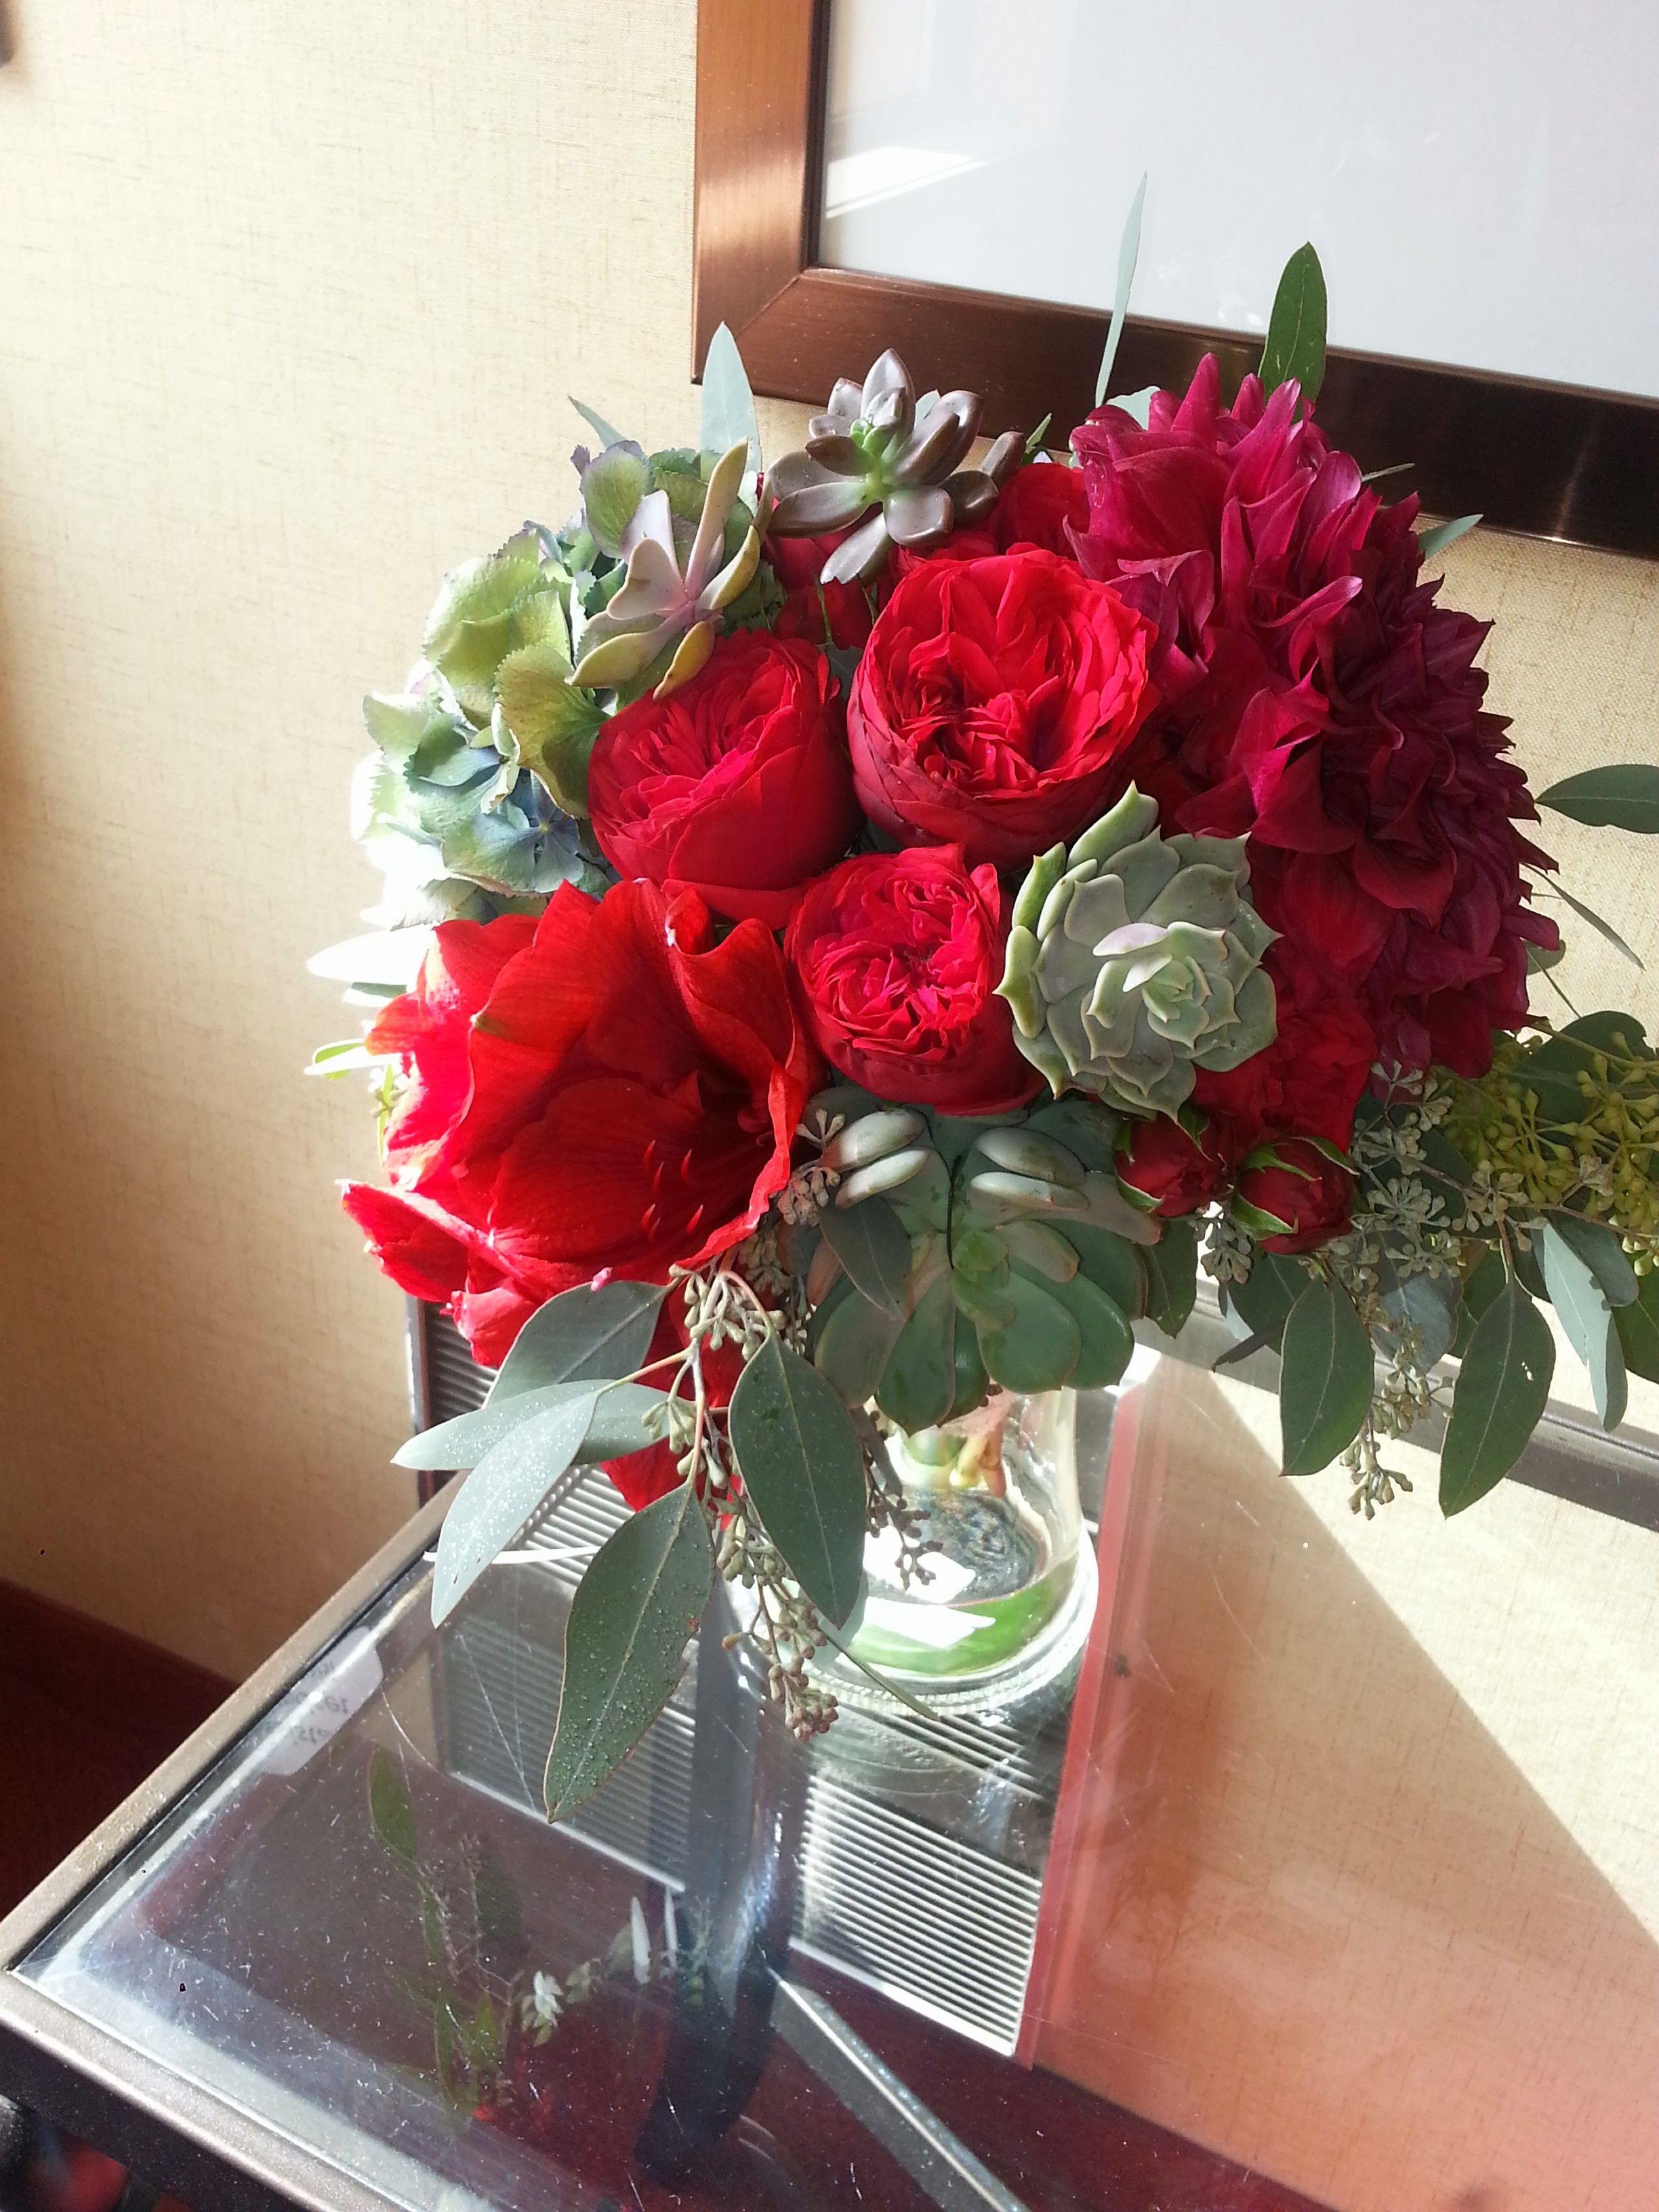 Pin By Laruna Jones On Wedding Succulent Bouquet Red Amaryllis Succulent Wedding Centerpieces